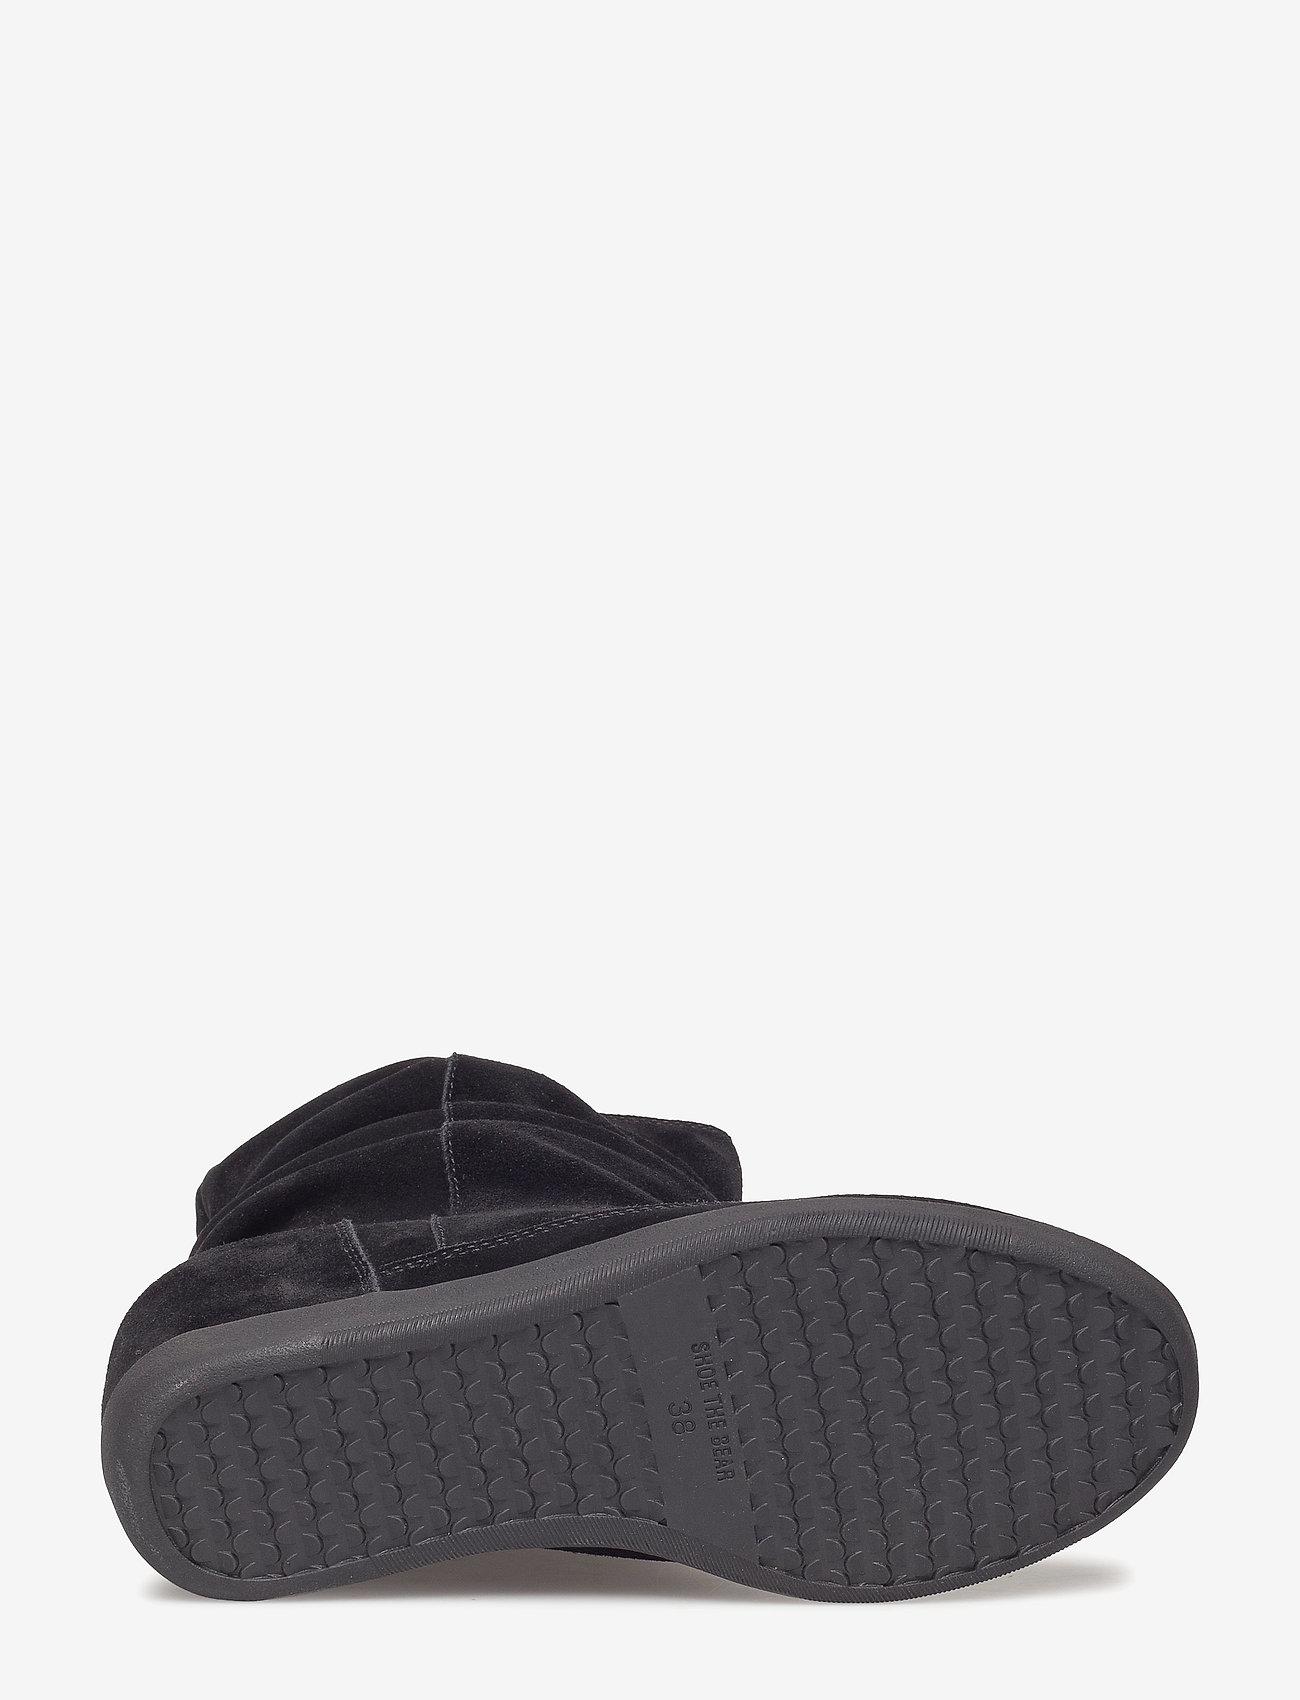 Emmy Slouchy Boot (Black / Black) - Shoe The Bear